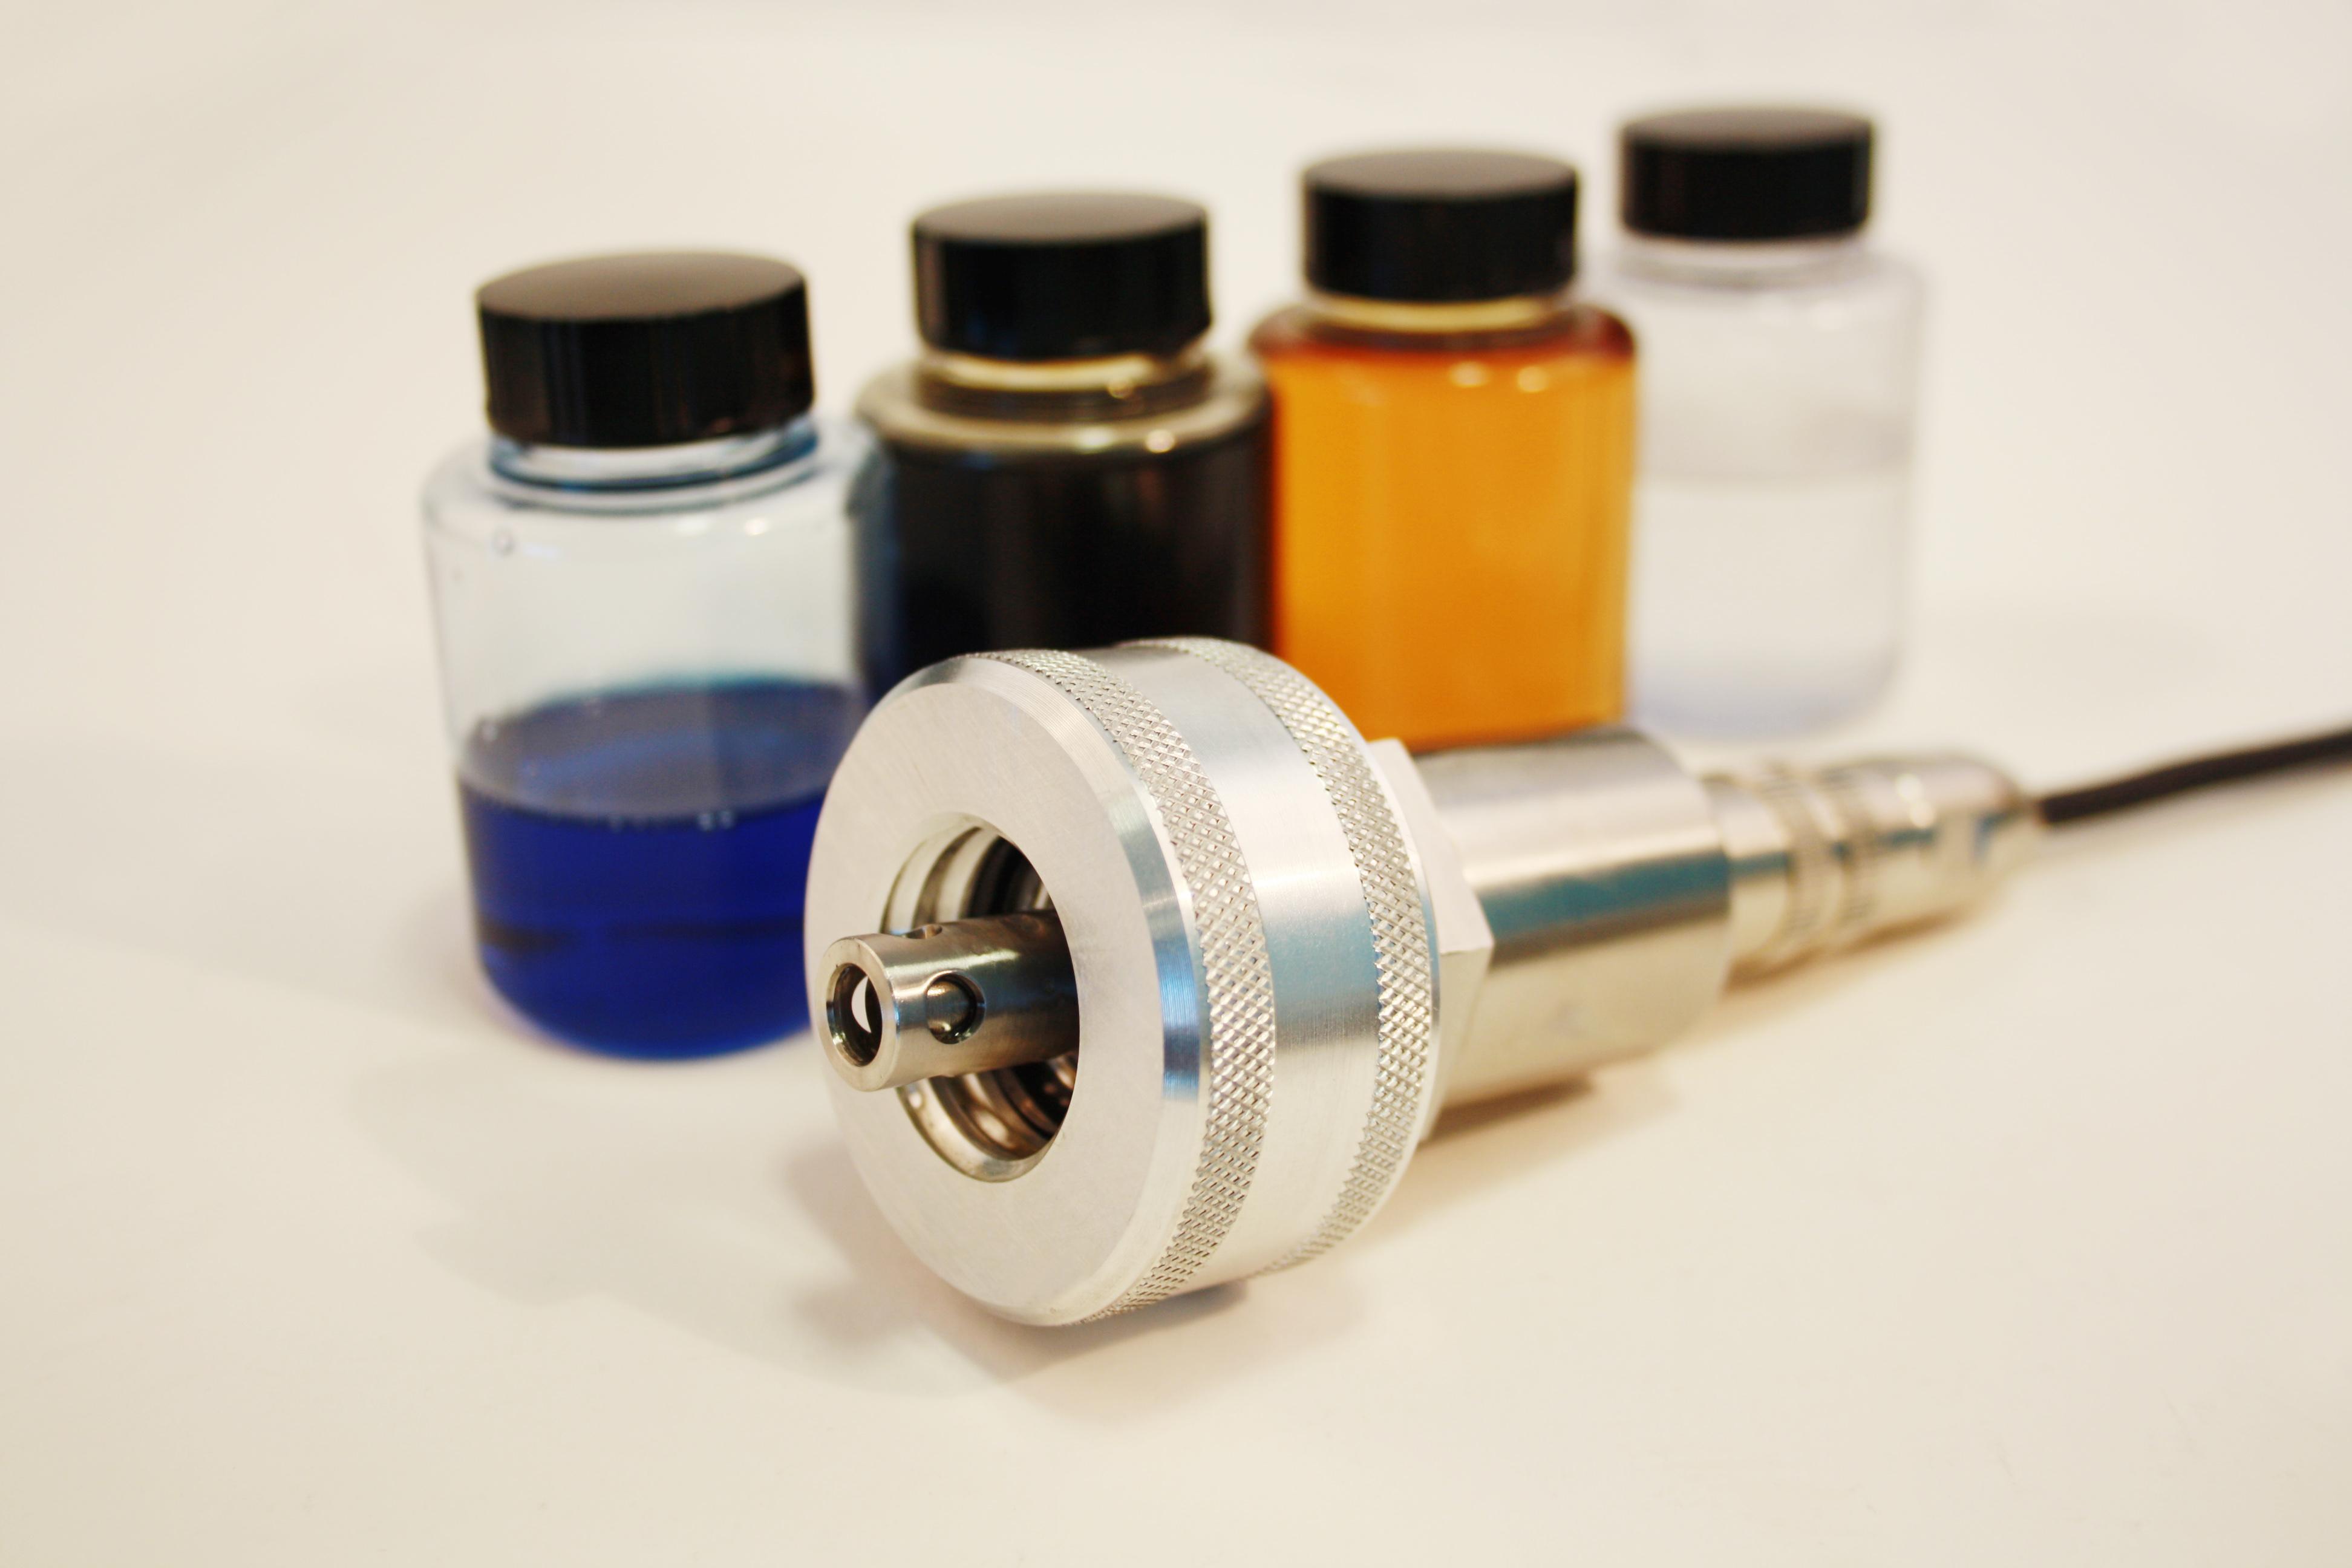 mobile oil testing kit